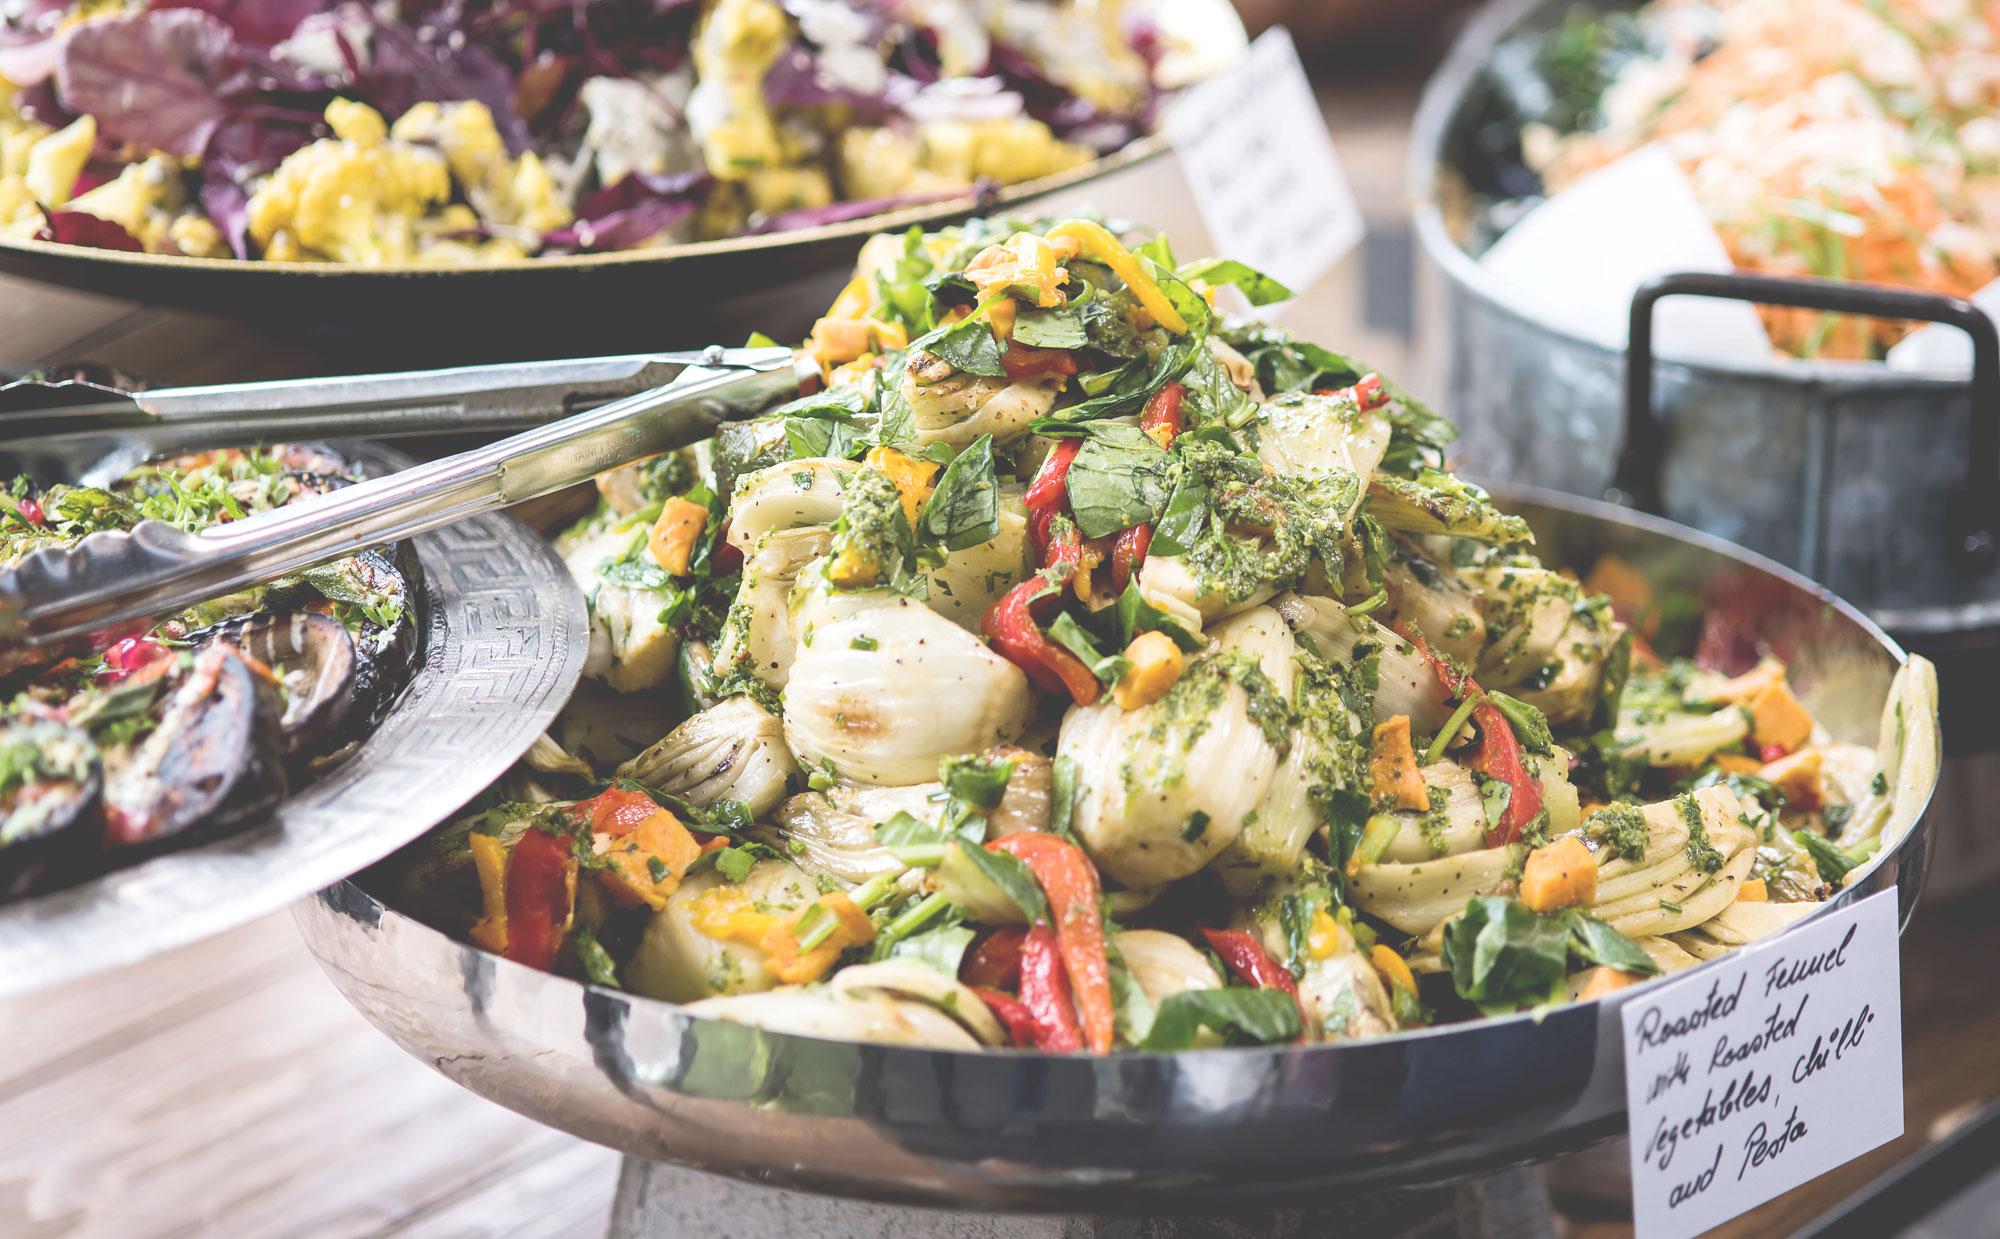 Gourmet Salad, Riverside Kitchen, Riverside Farmers' Market